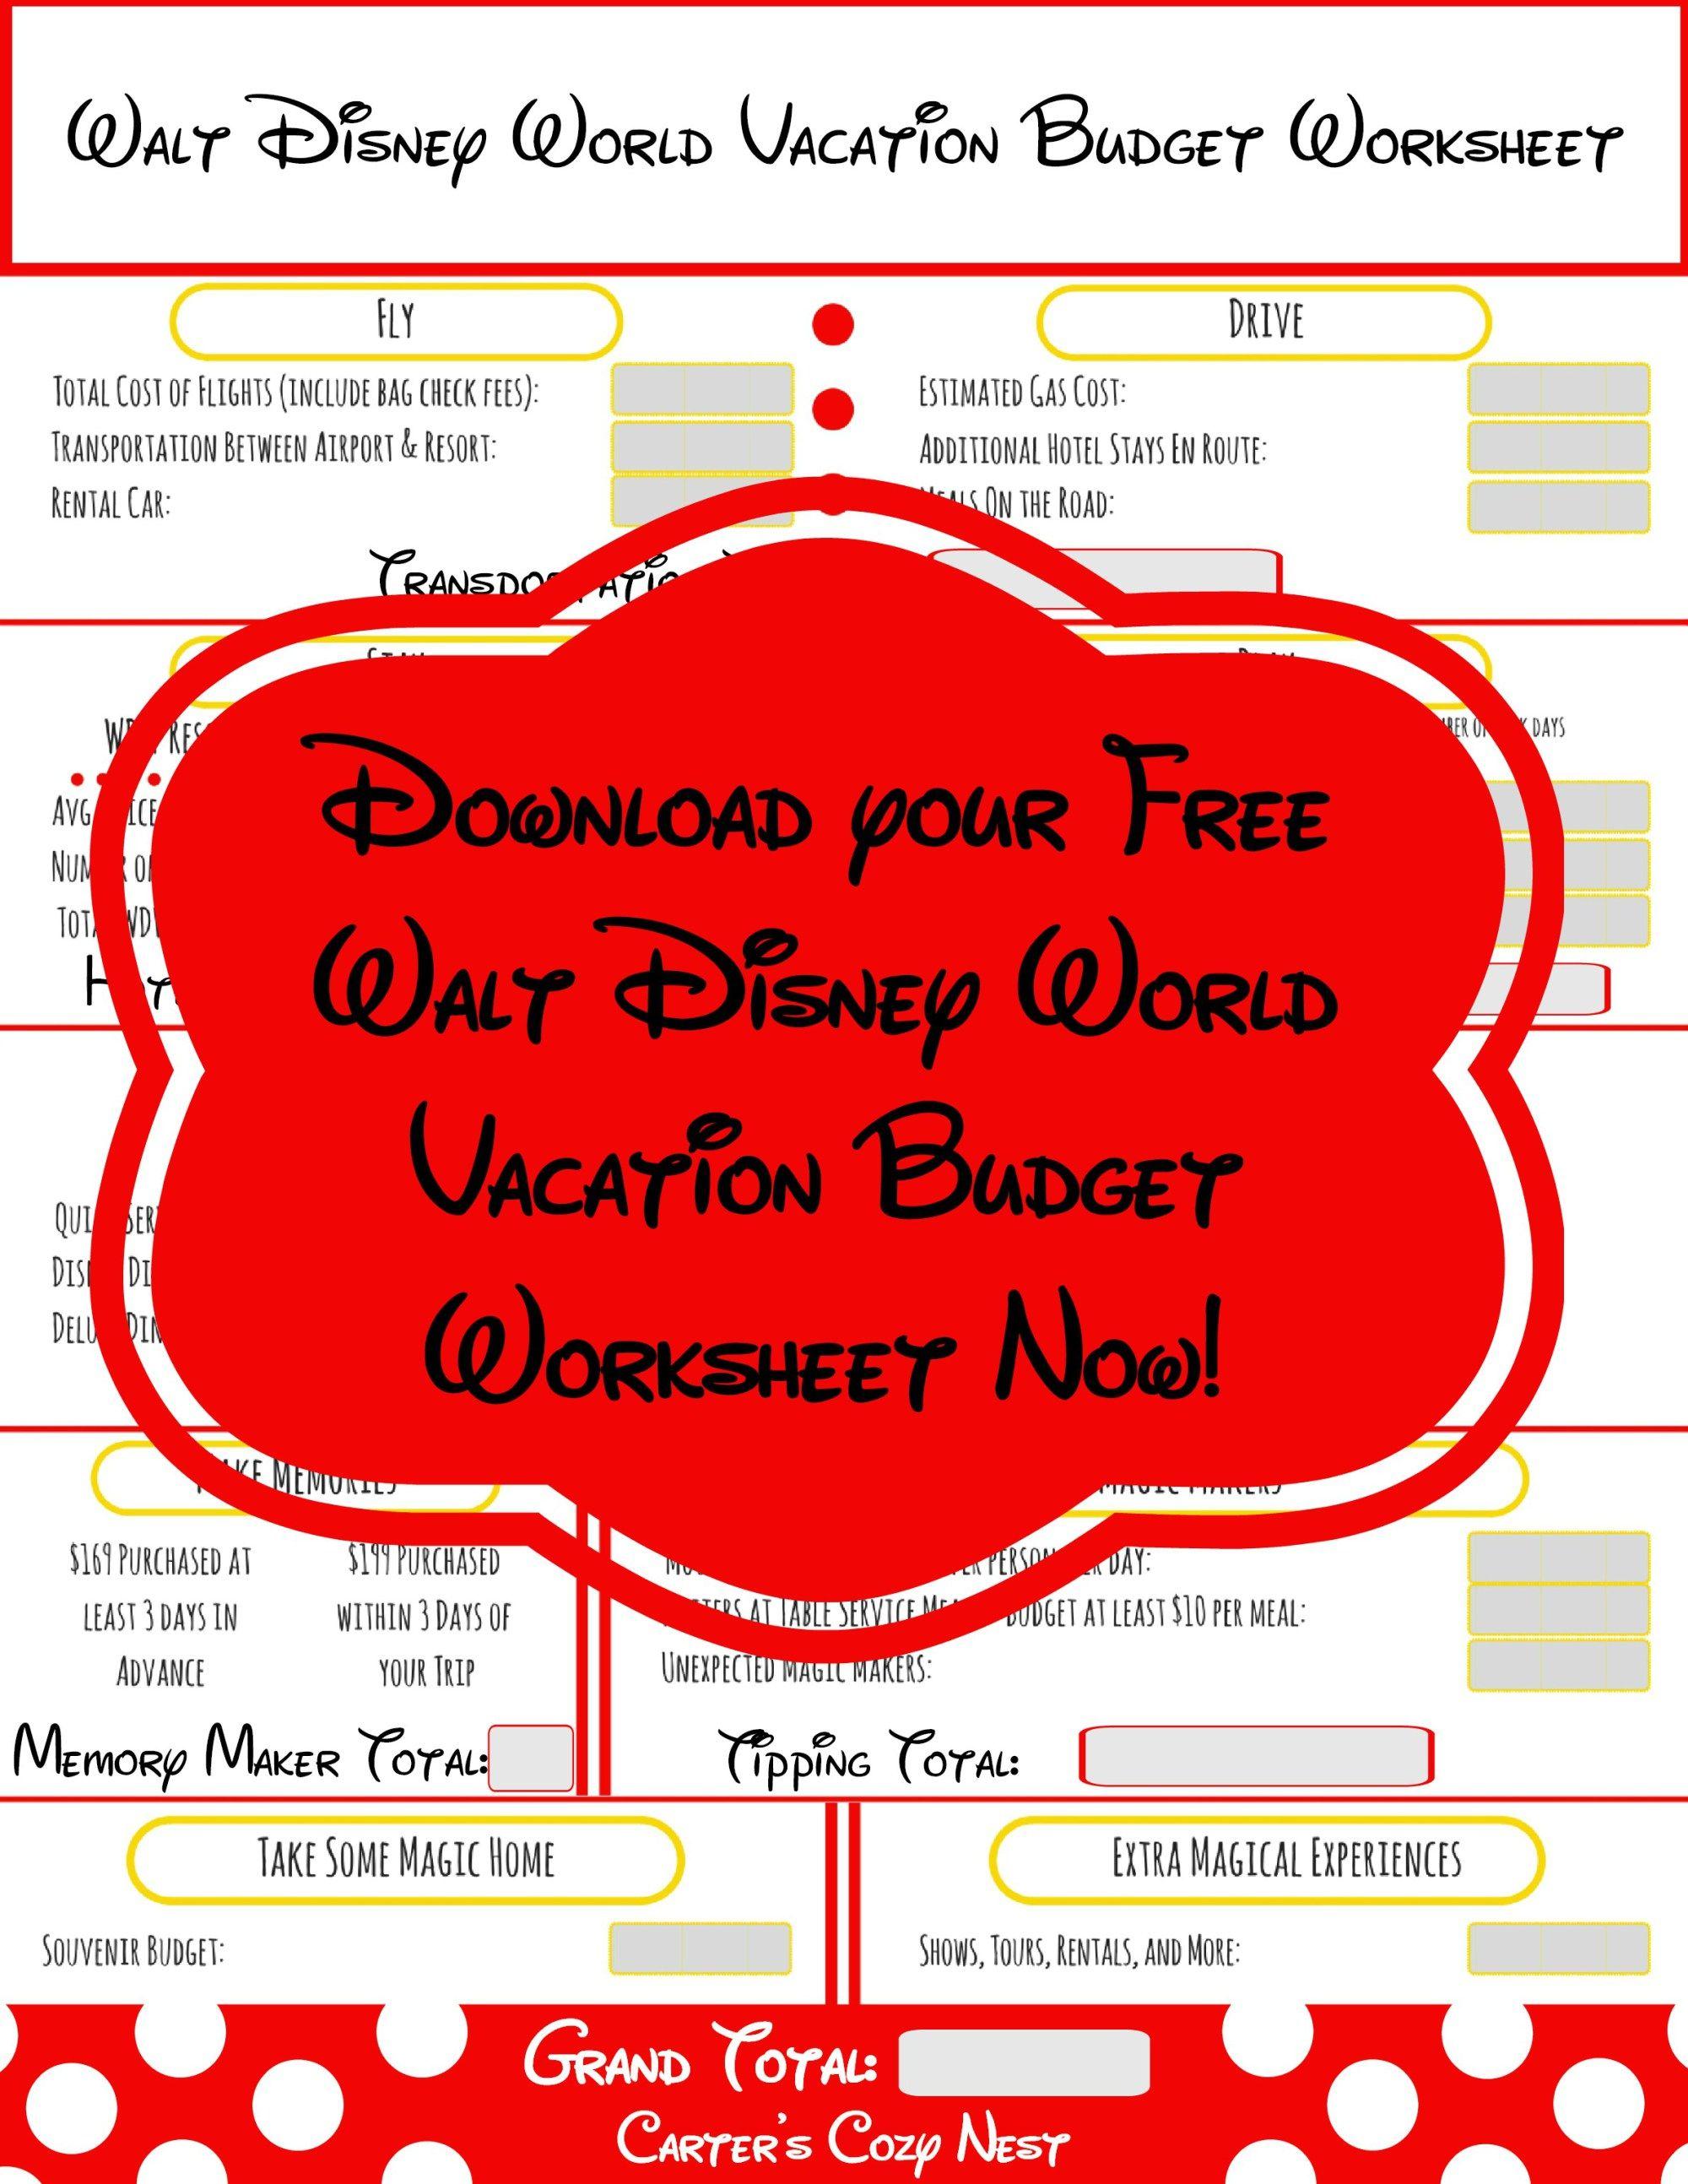 Walt Disney World Vacation Budget Worksheet  Disney world